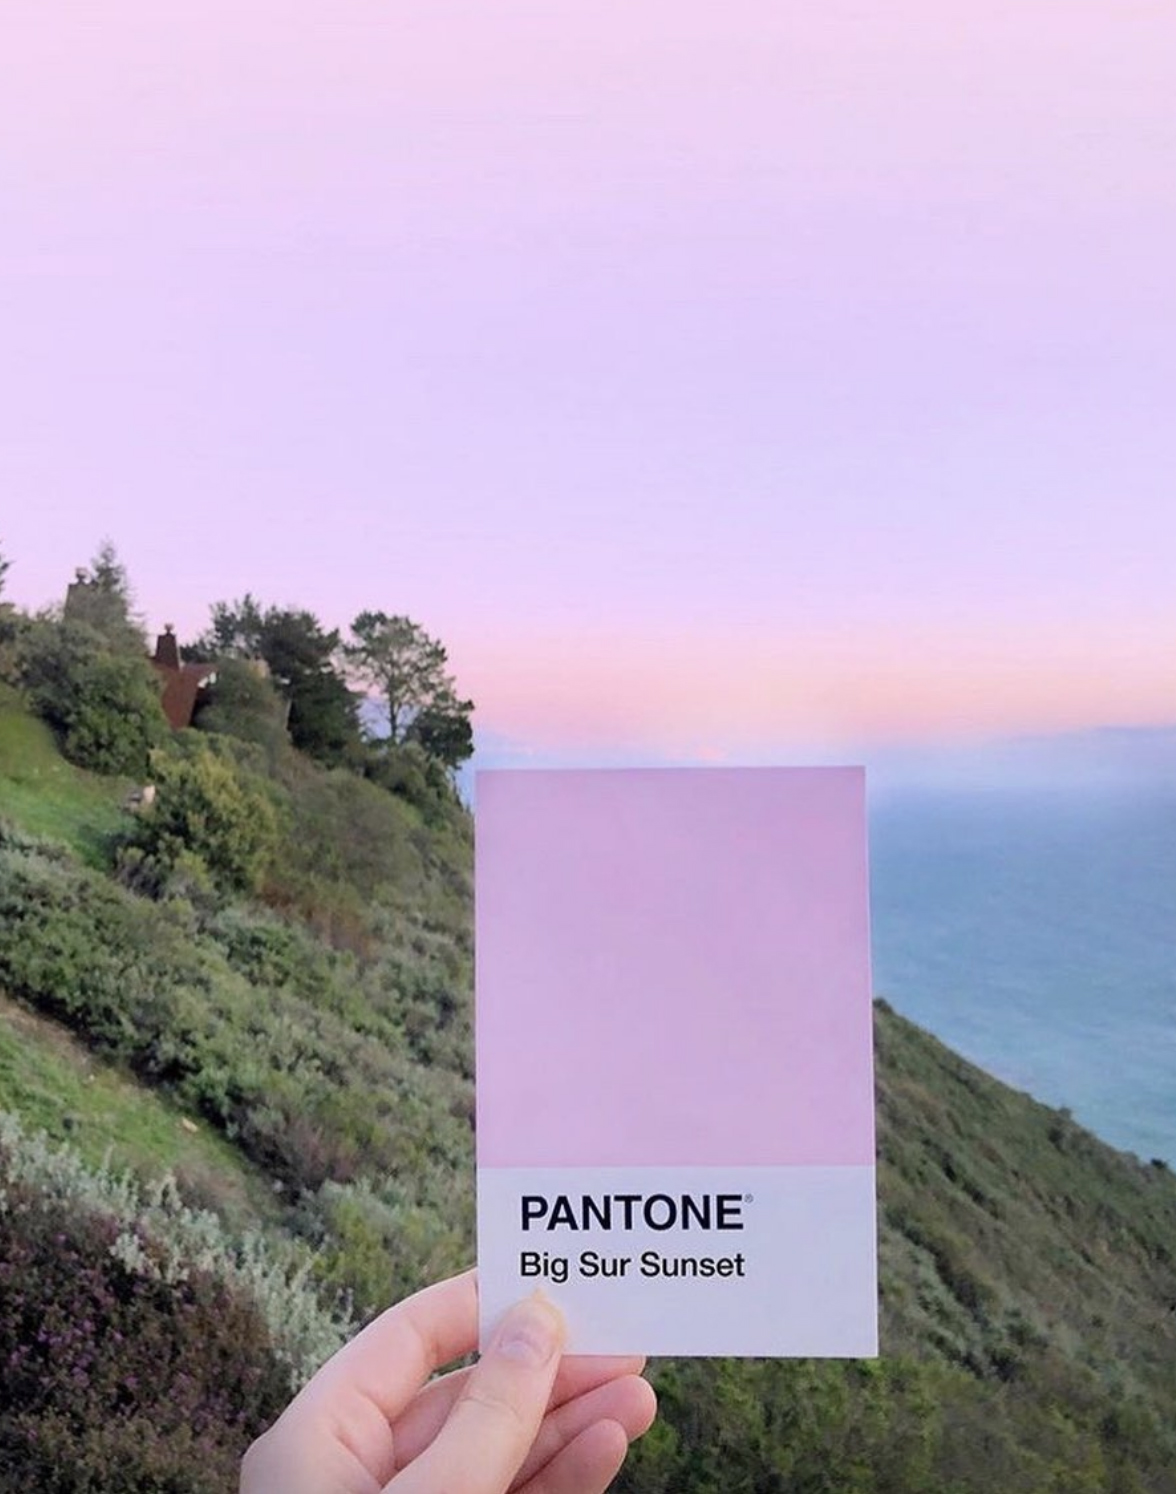 Pantone Bug Sur Sunset